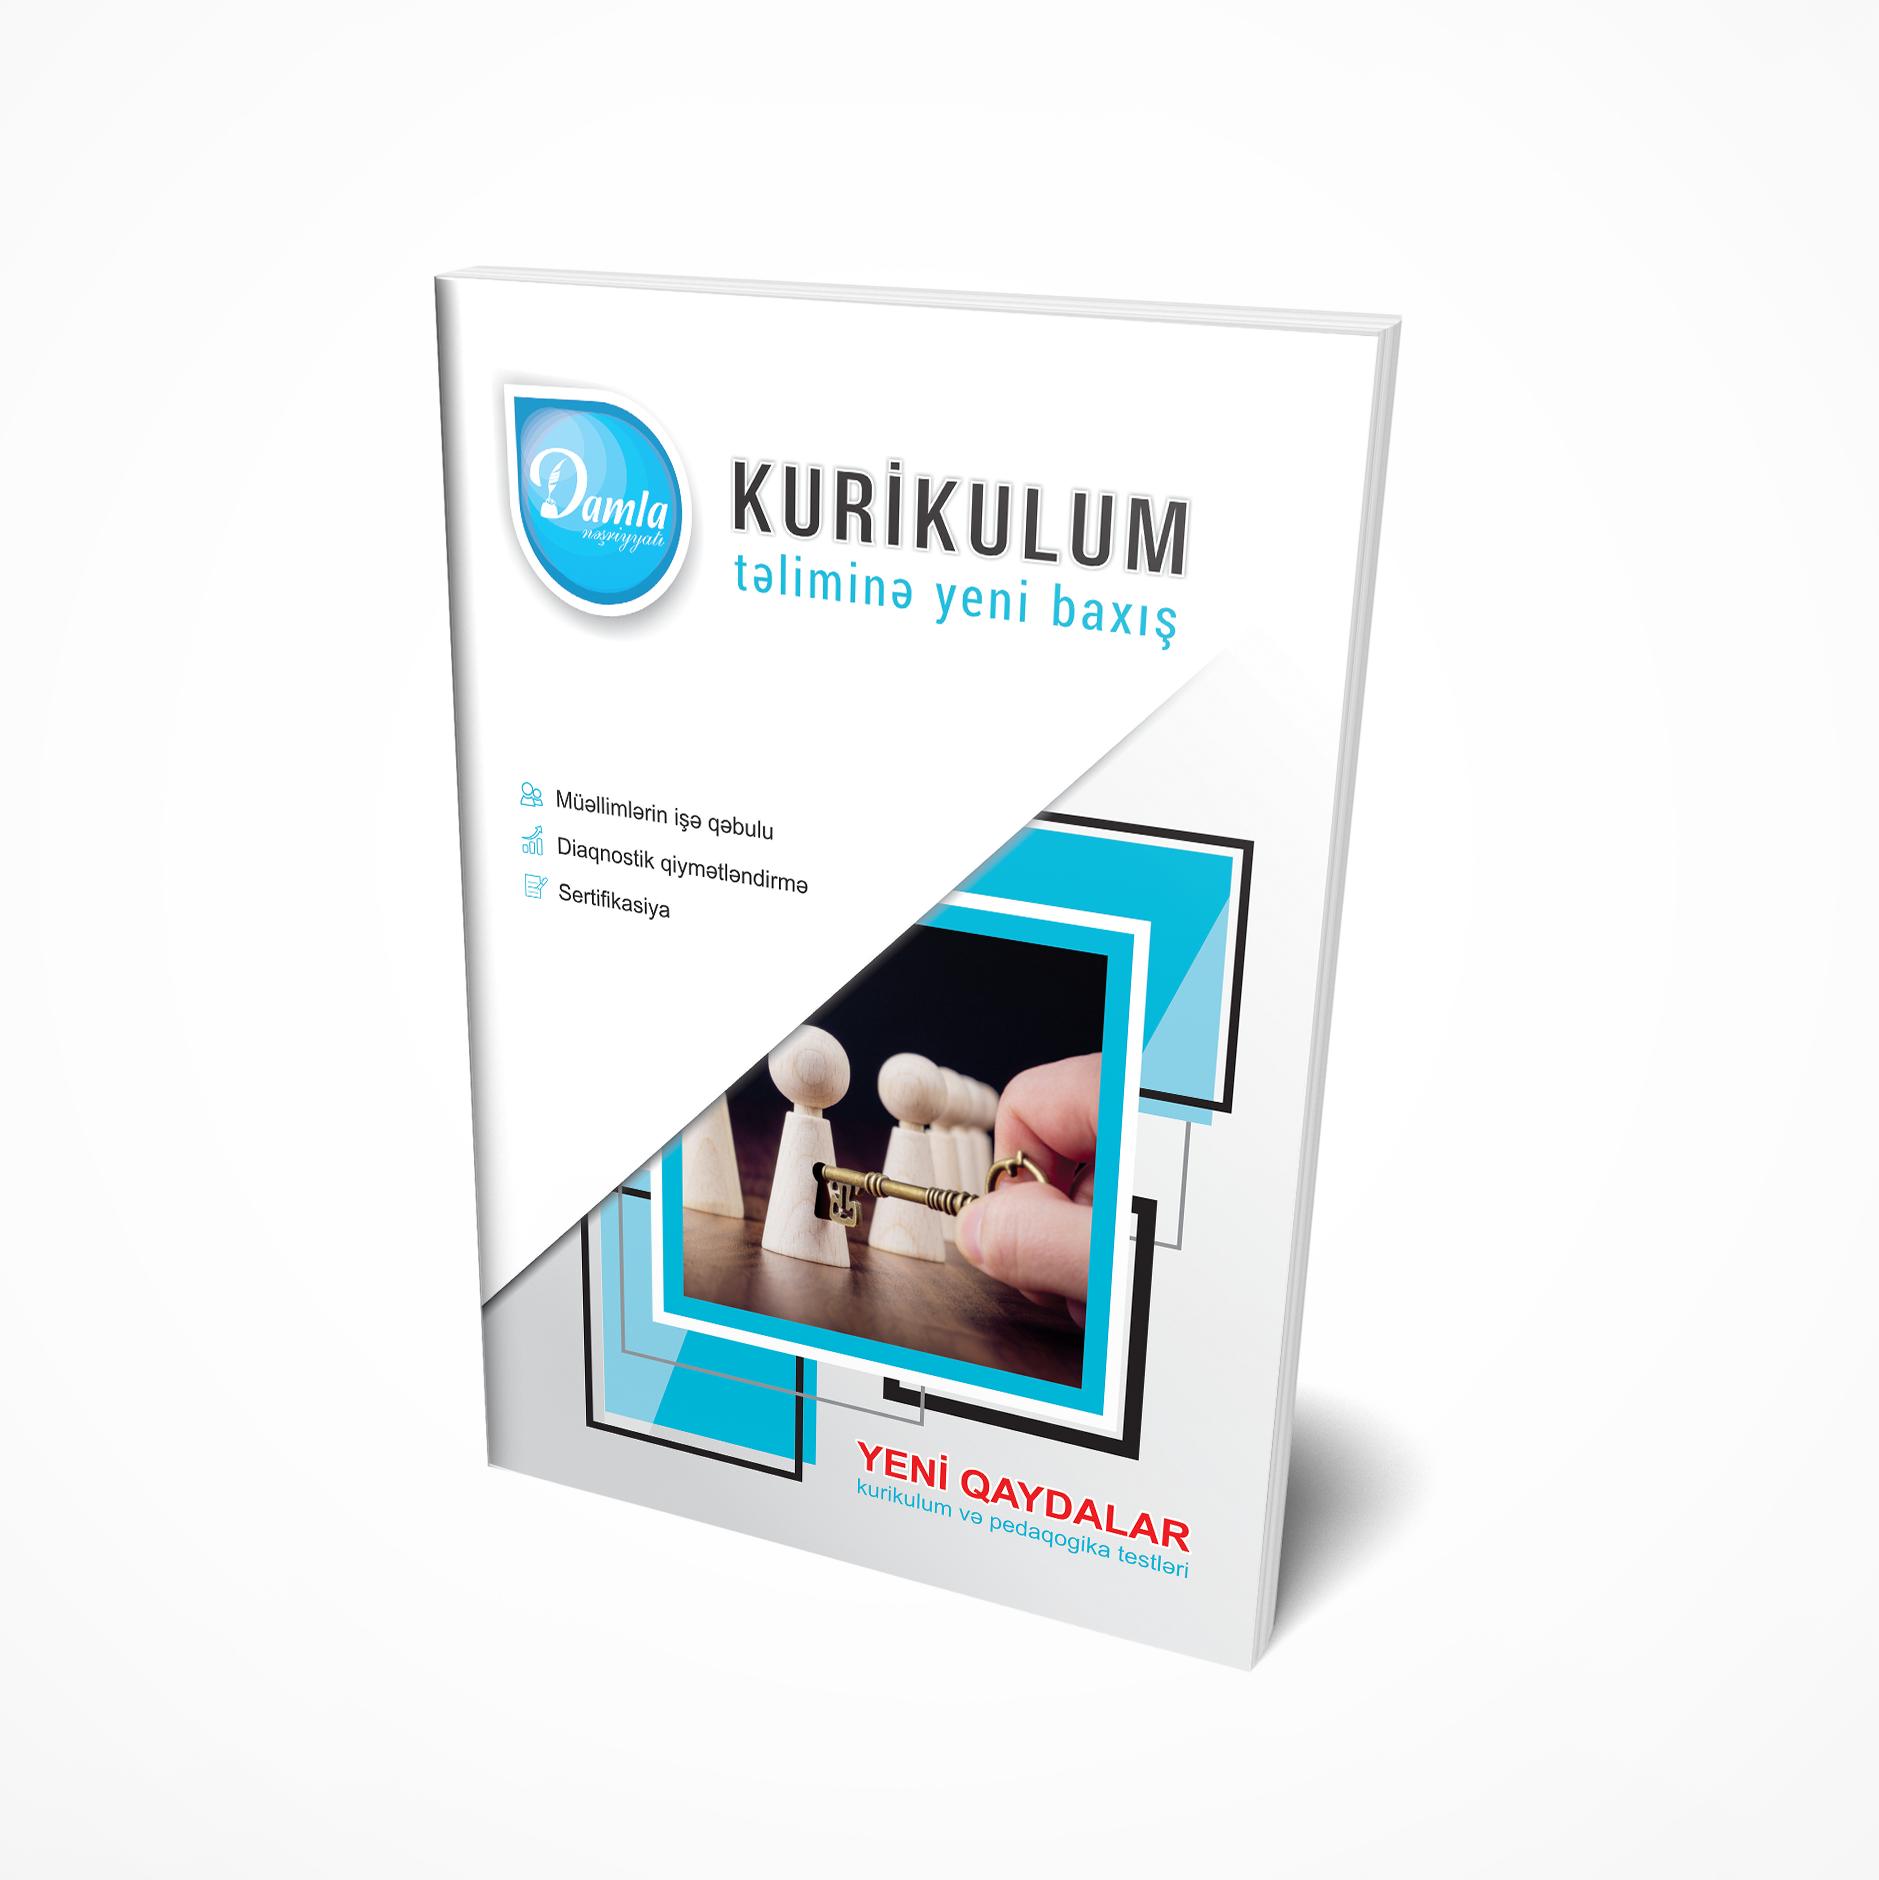 Kurikulum Miq Convenience Store Products